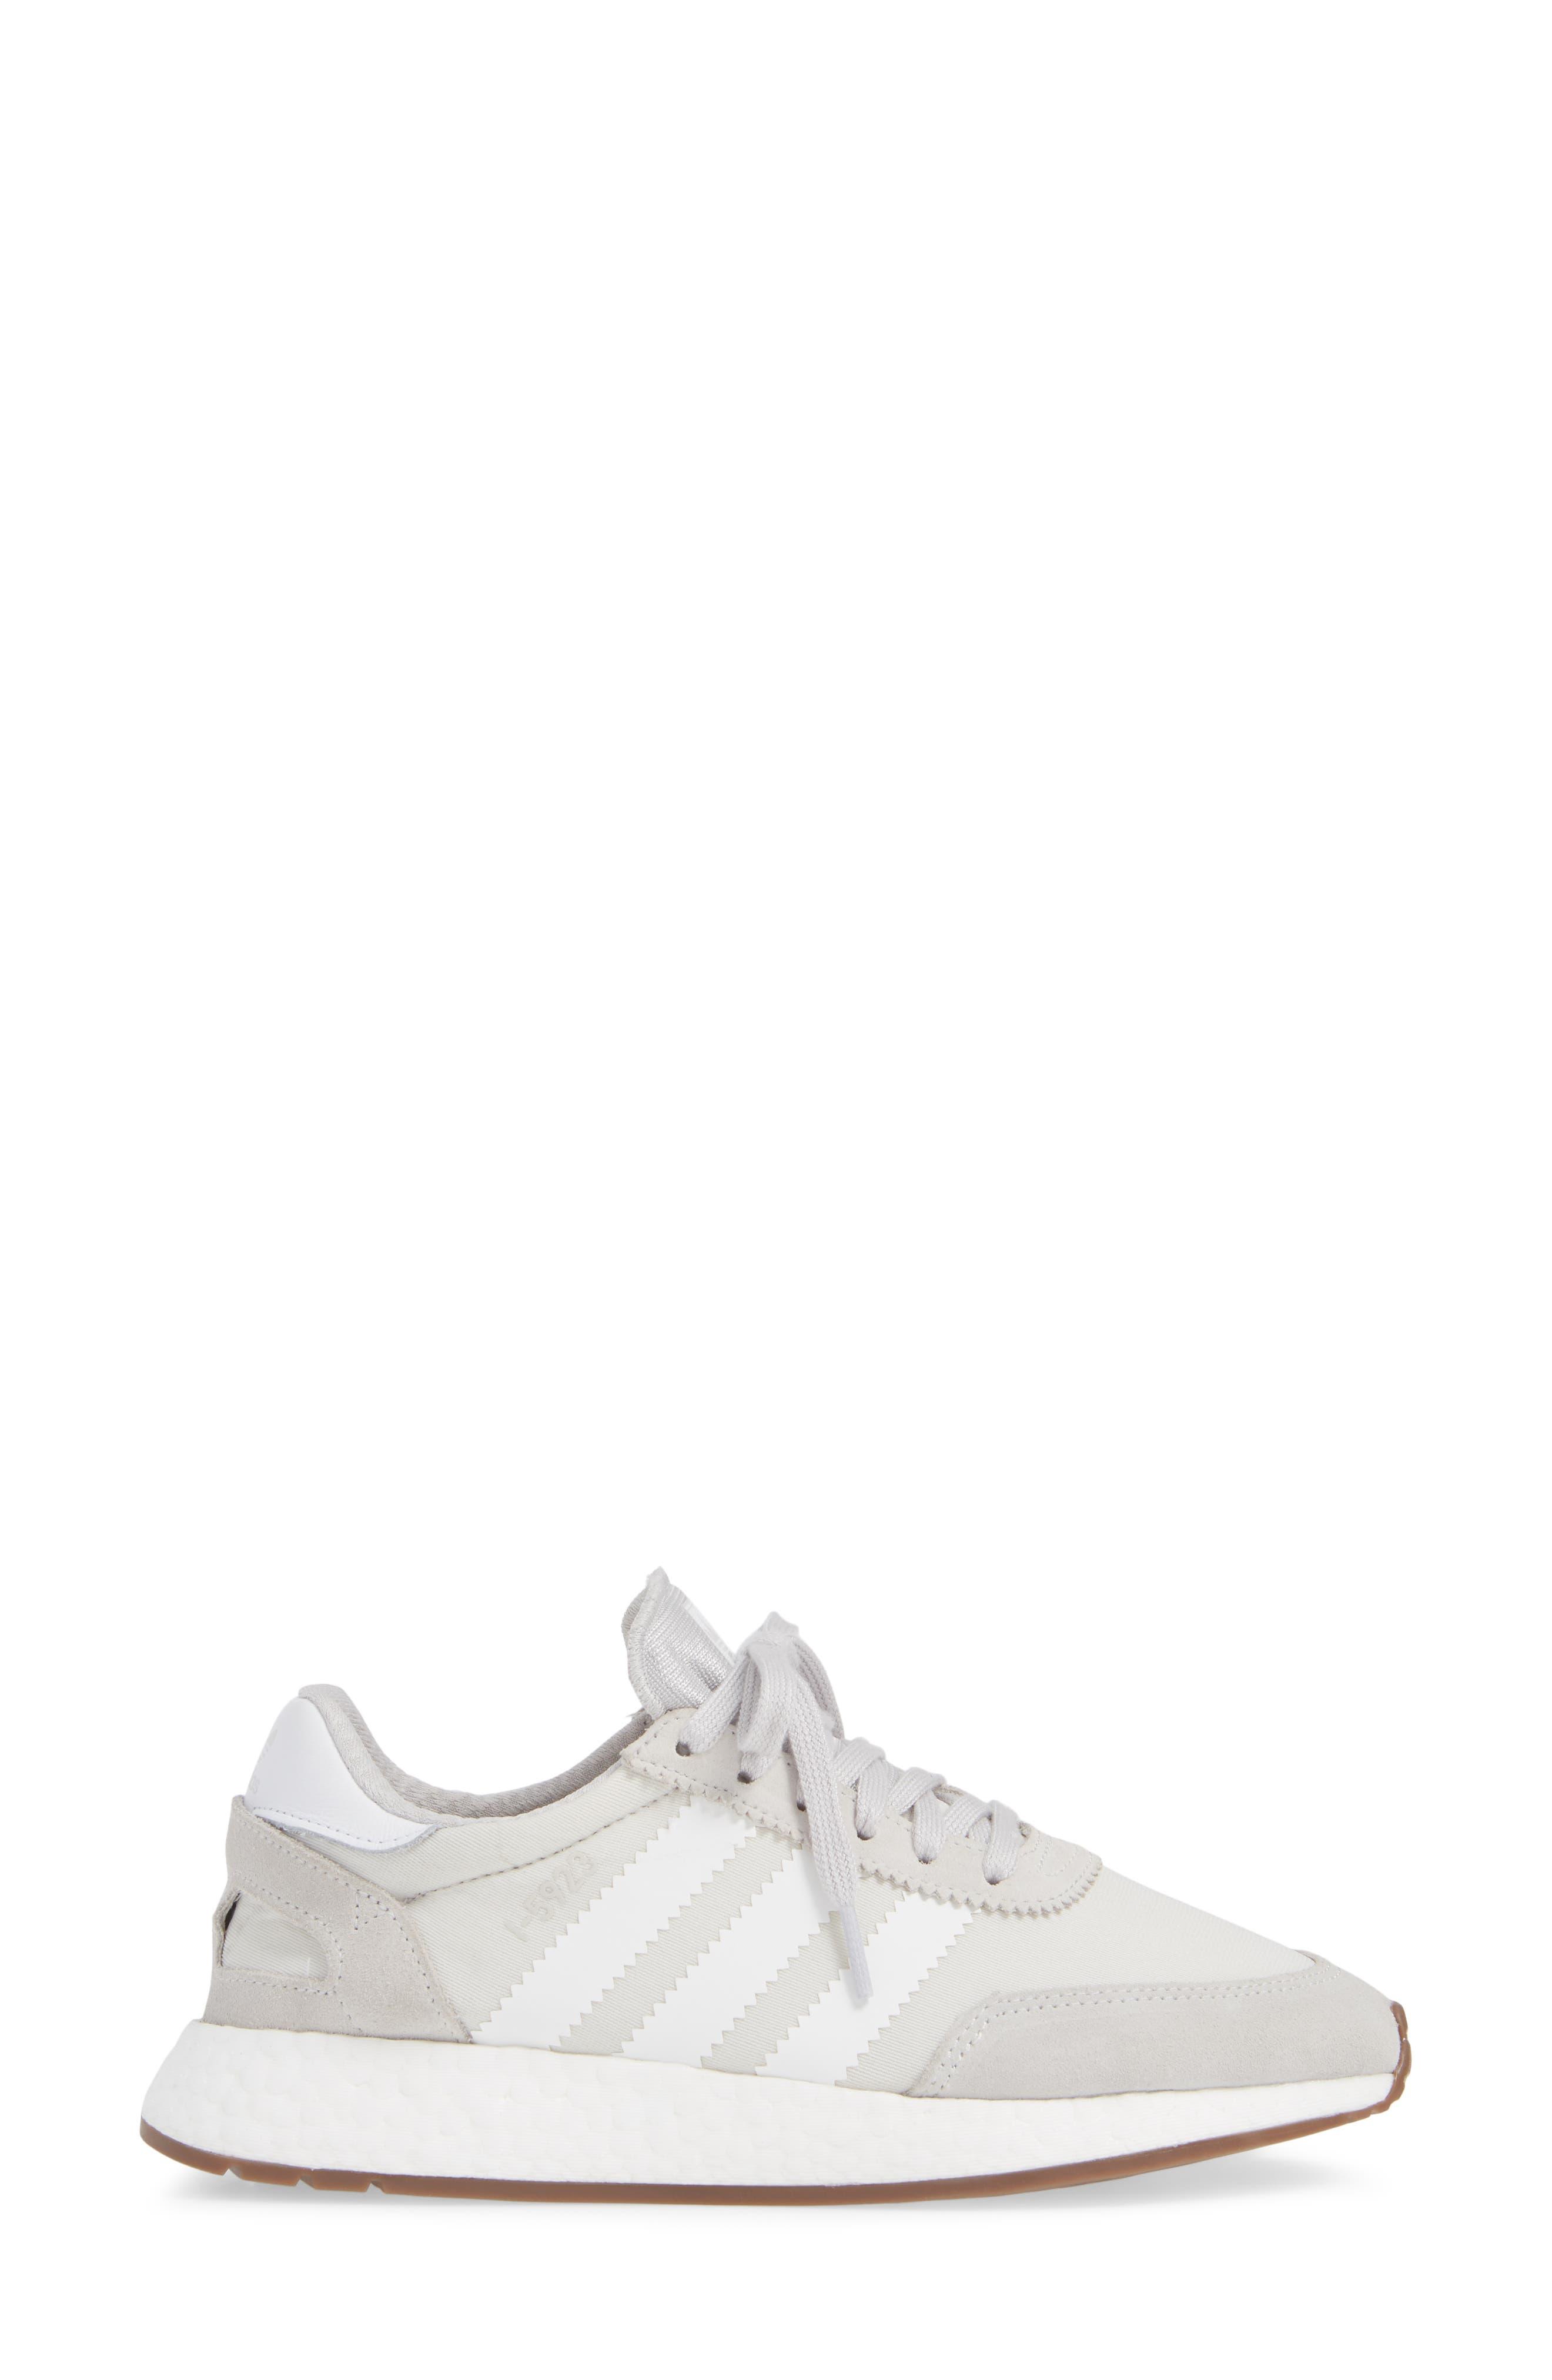 I-5923 Sneaker,                             Alternate thumbnail 3, color,                             GREY ONE/ WHITE/ GREY FIVE